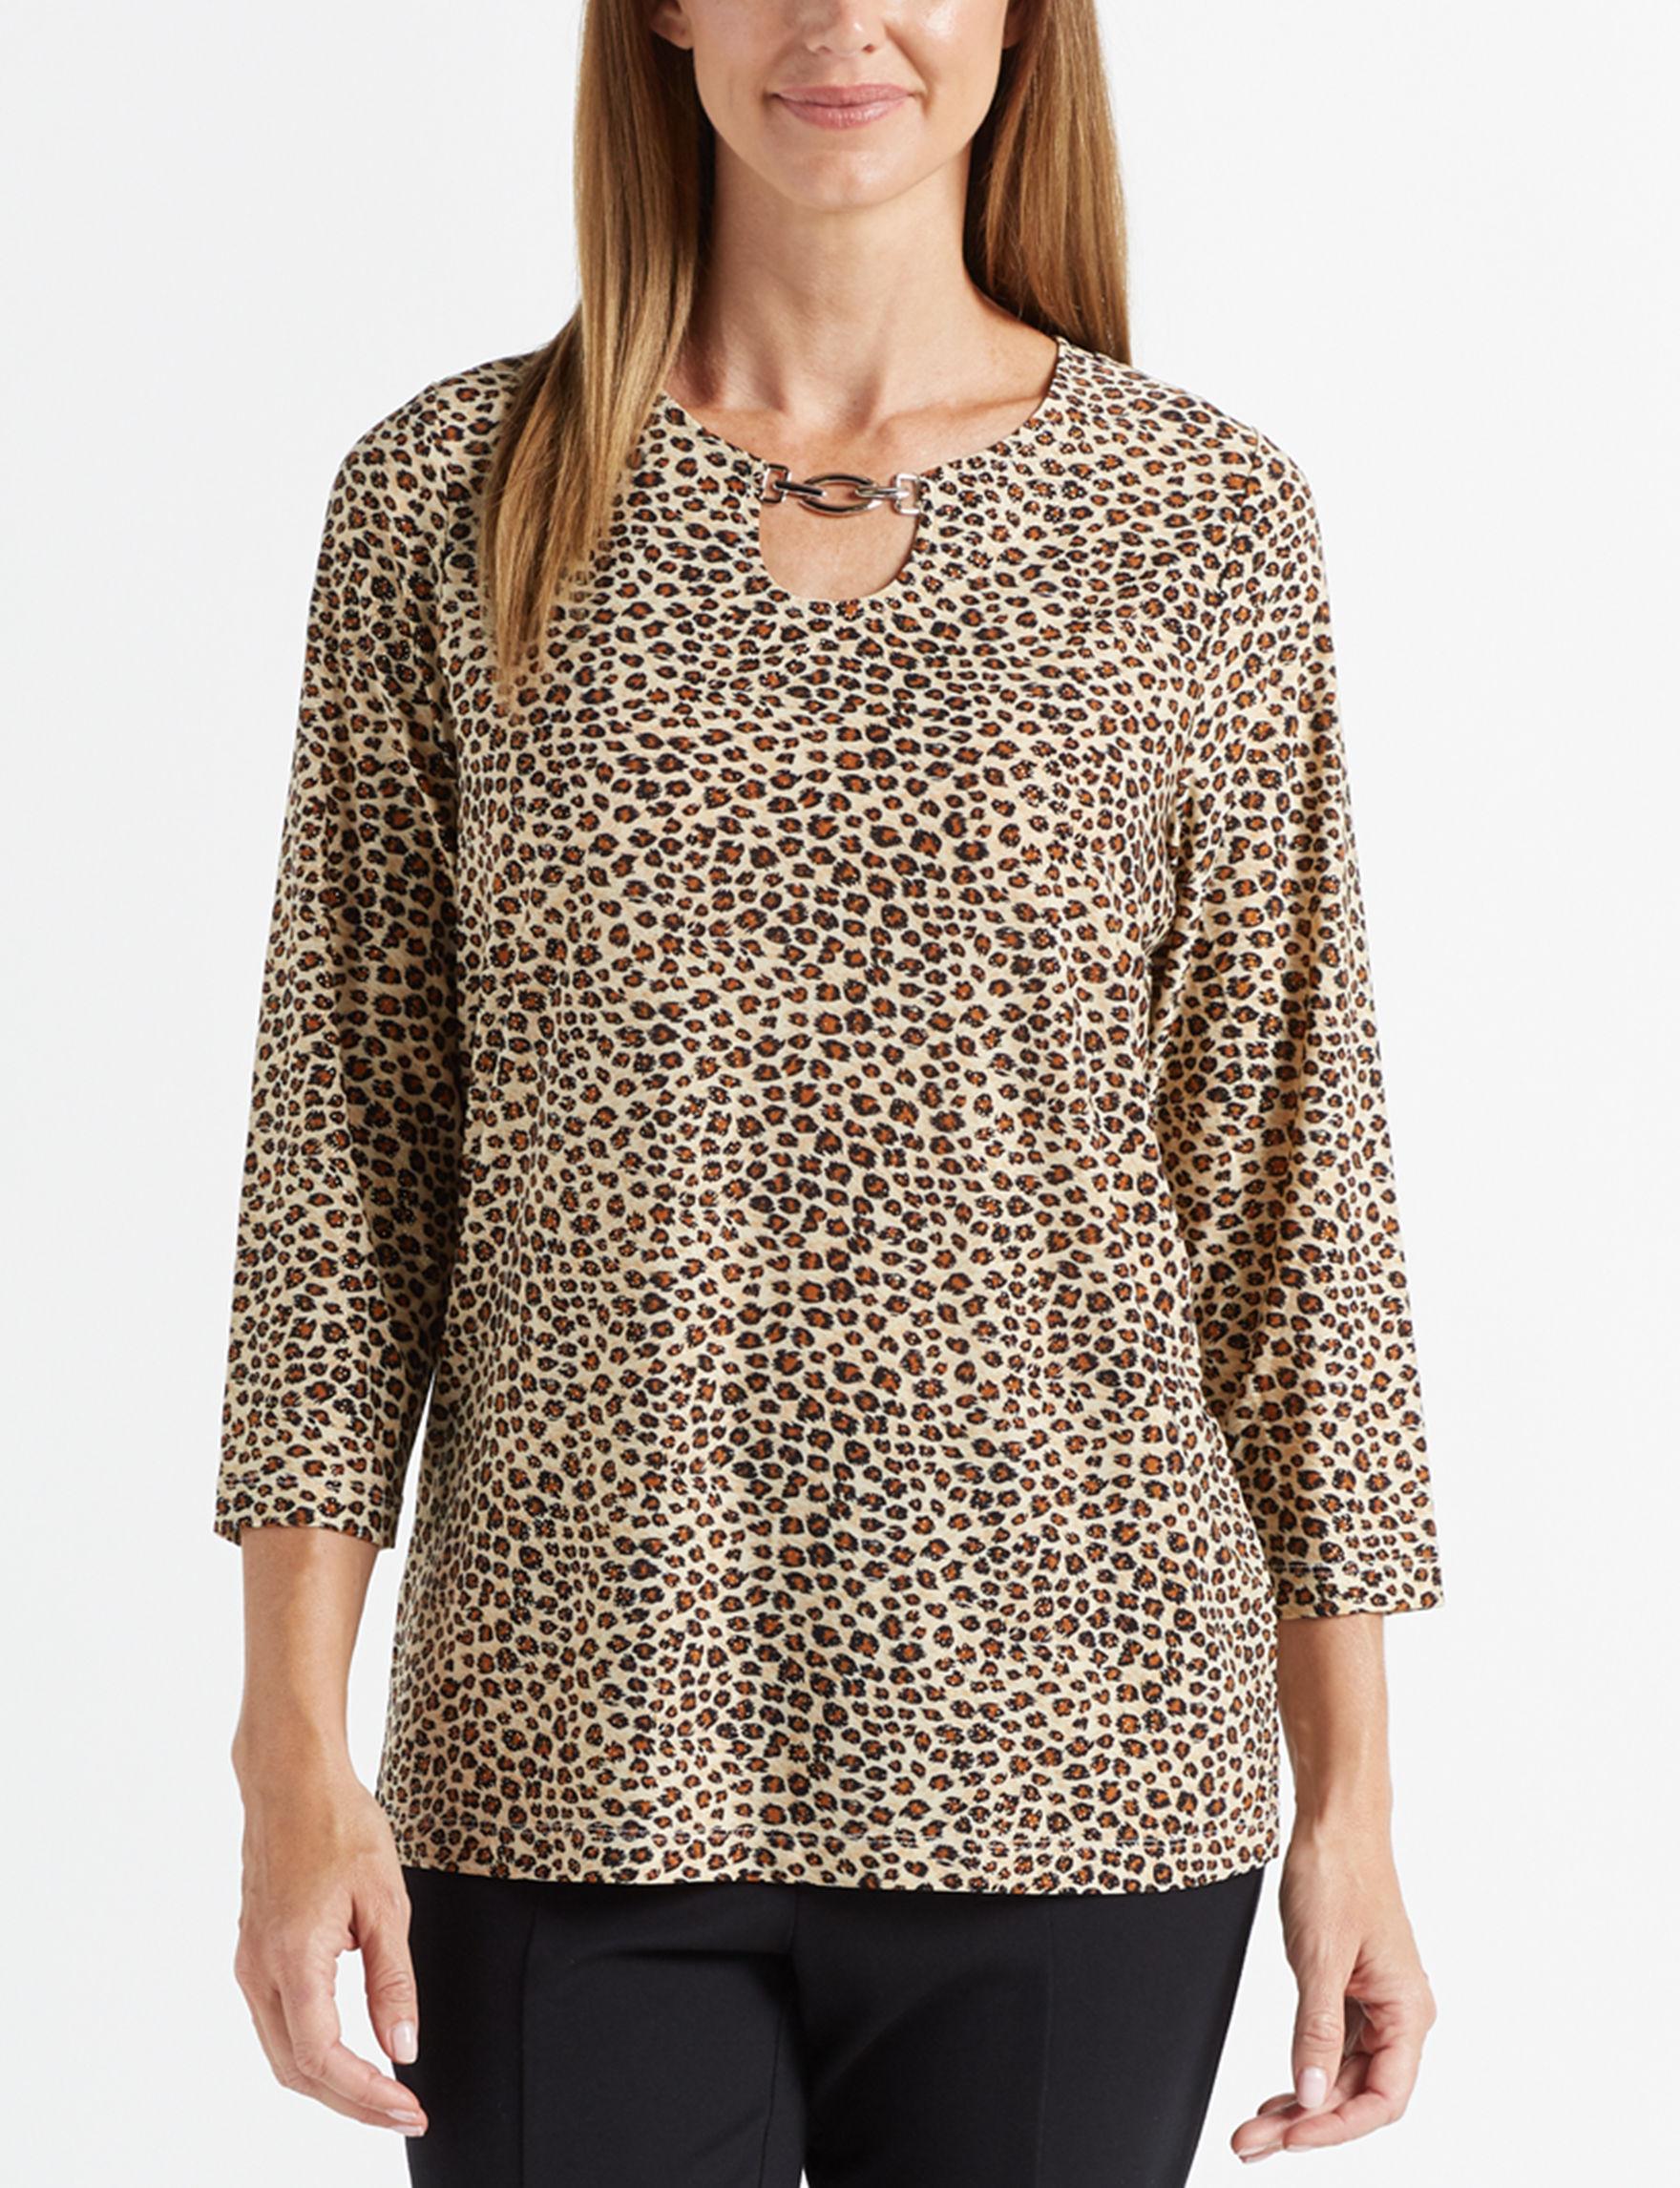 Rebecca Malone Leopard Shirts & Blouses